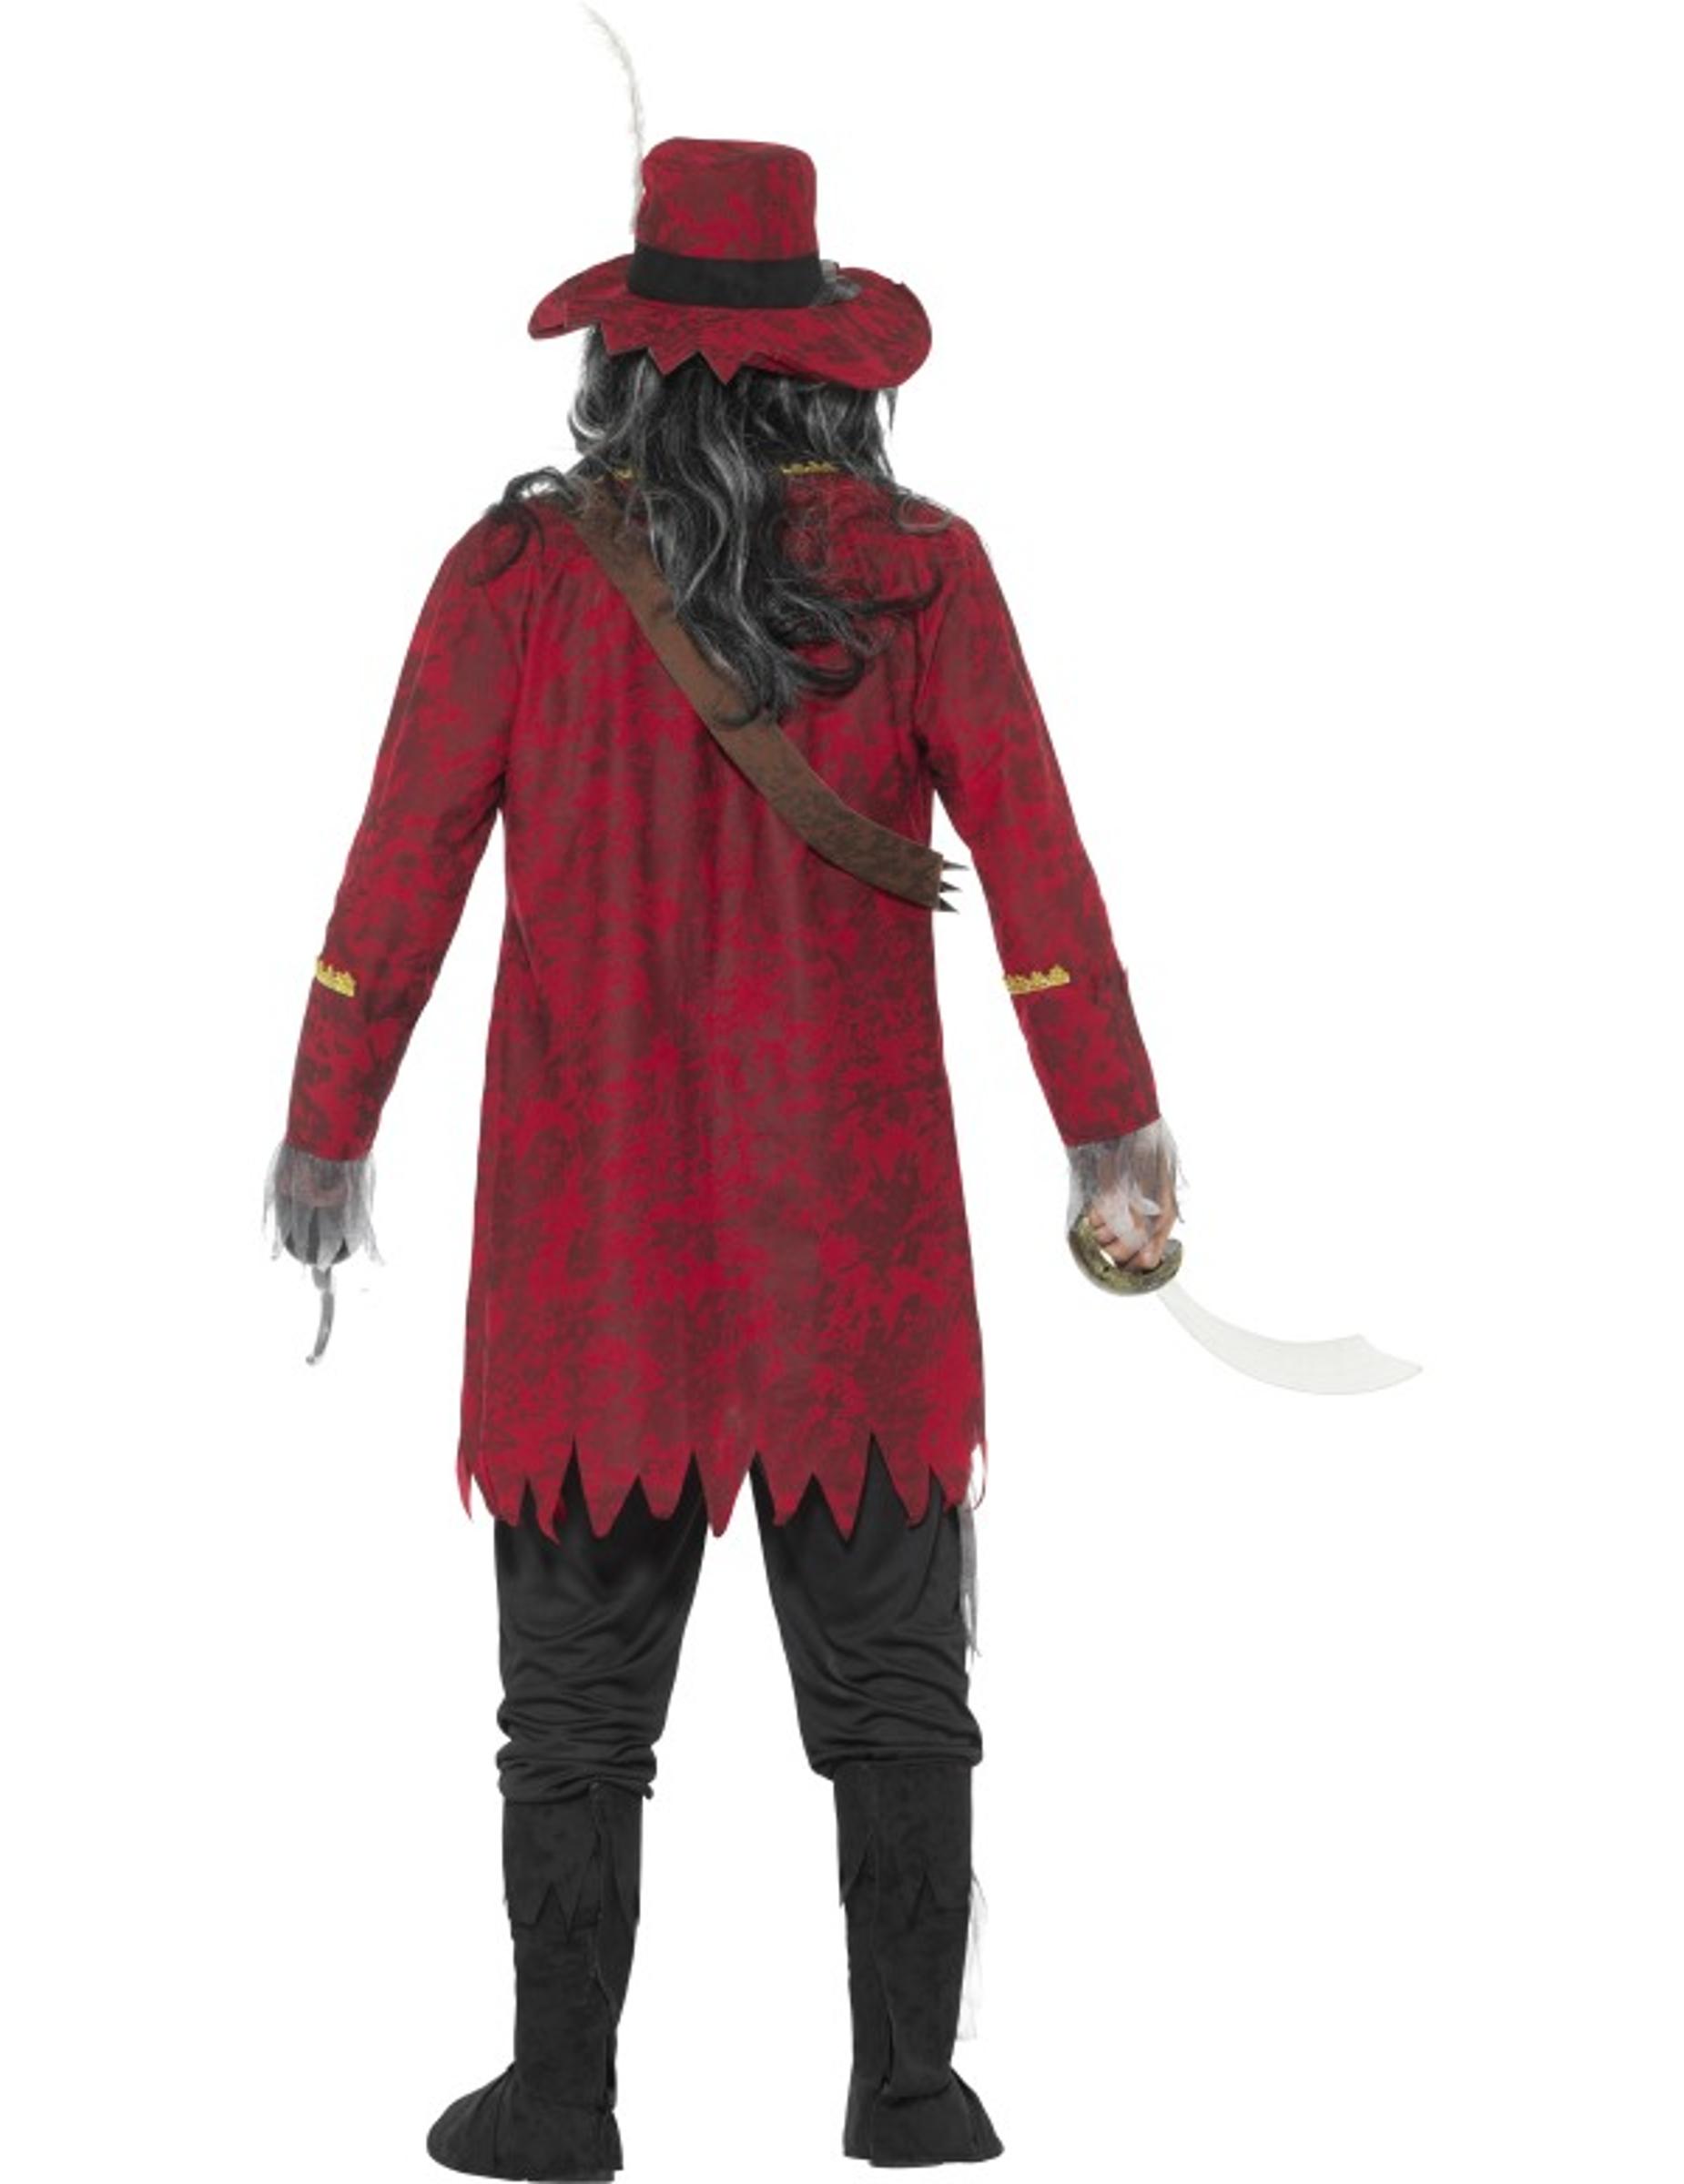 Lyxig zombiepirat - Halloweenkostym för vuxna 9d04086554a75